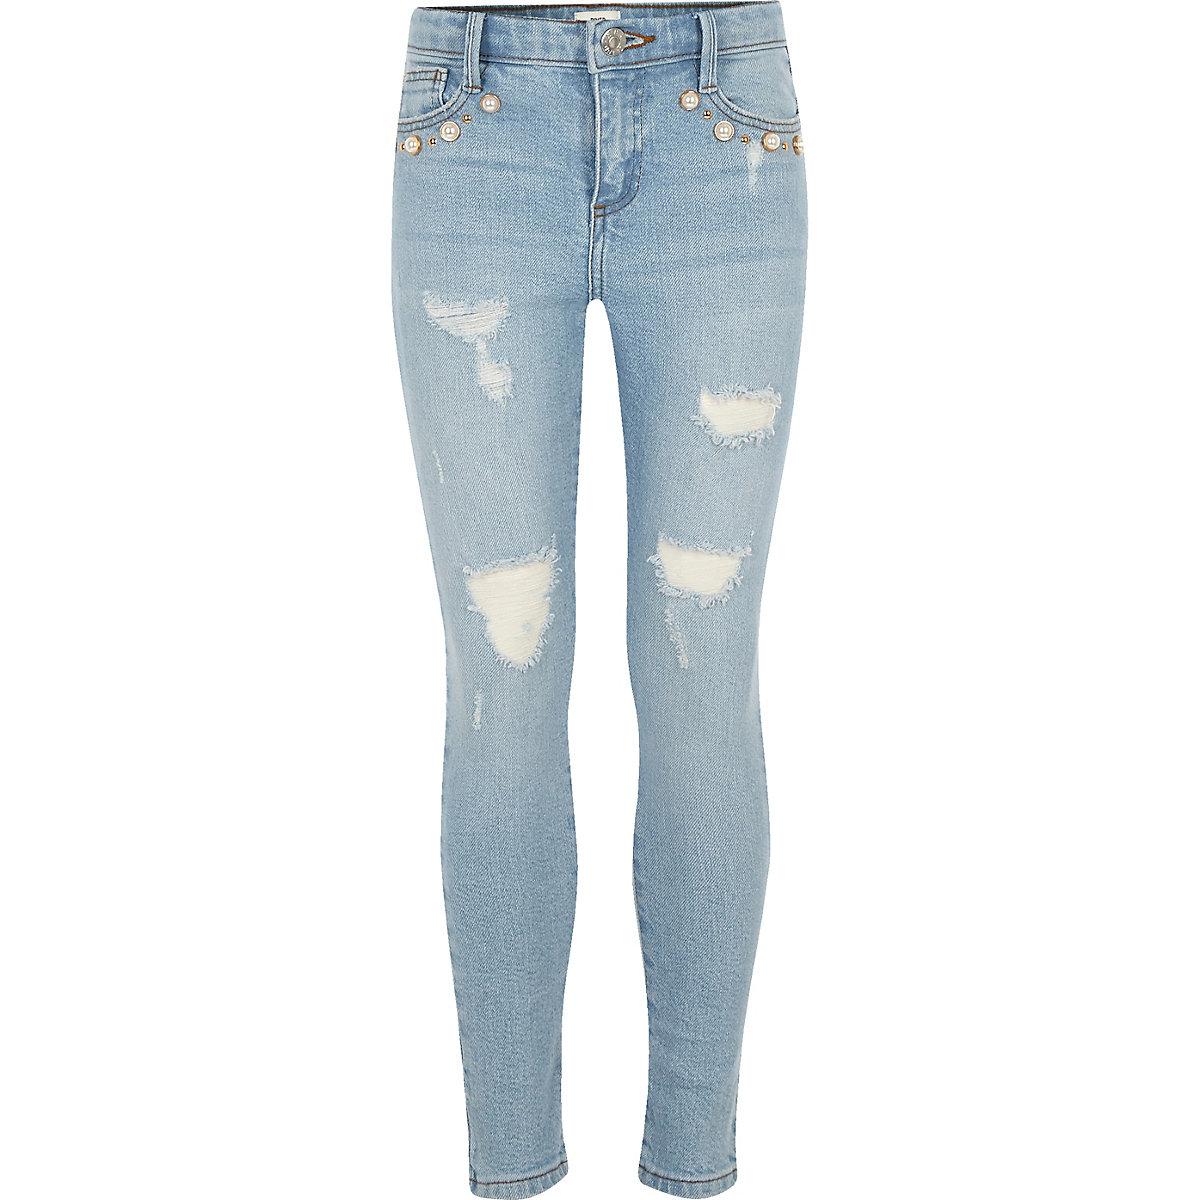 Girls light blue wash Amelie pearl jeans